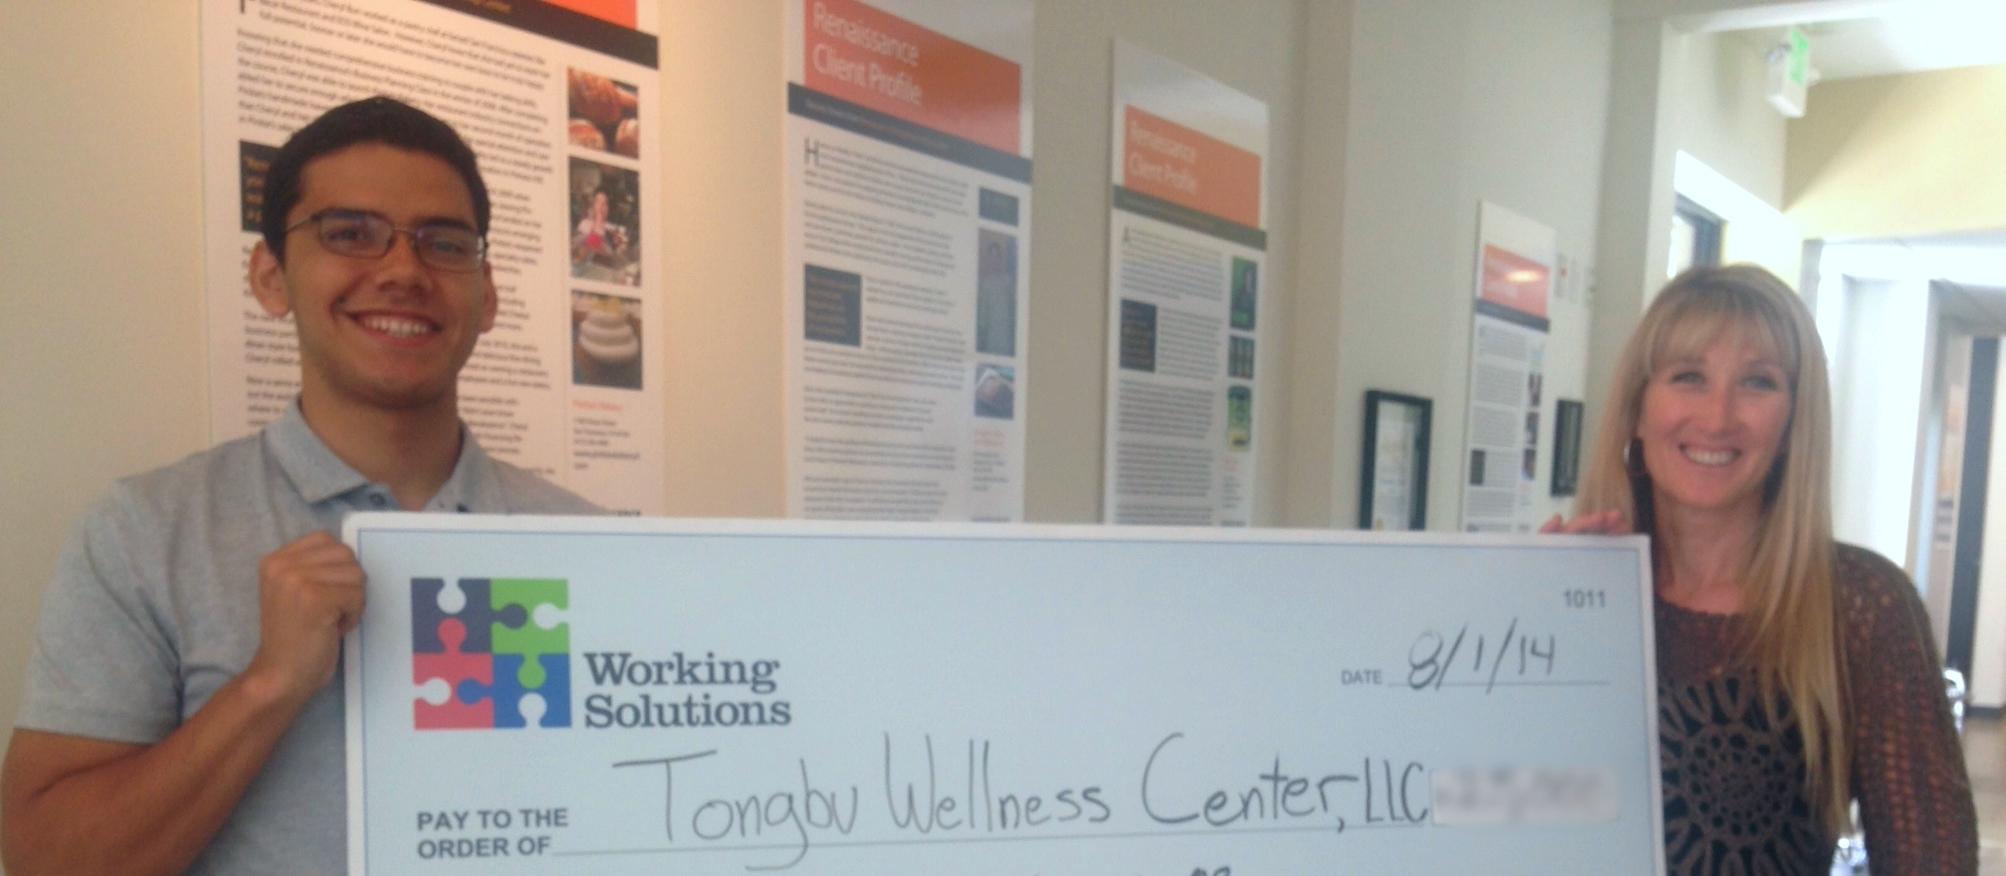 Working Solutions Business Lending Associate Roberto Hernandez with Tongbu Wellness Center Owner Heide Nielsen